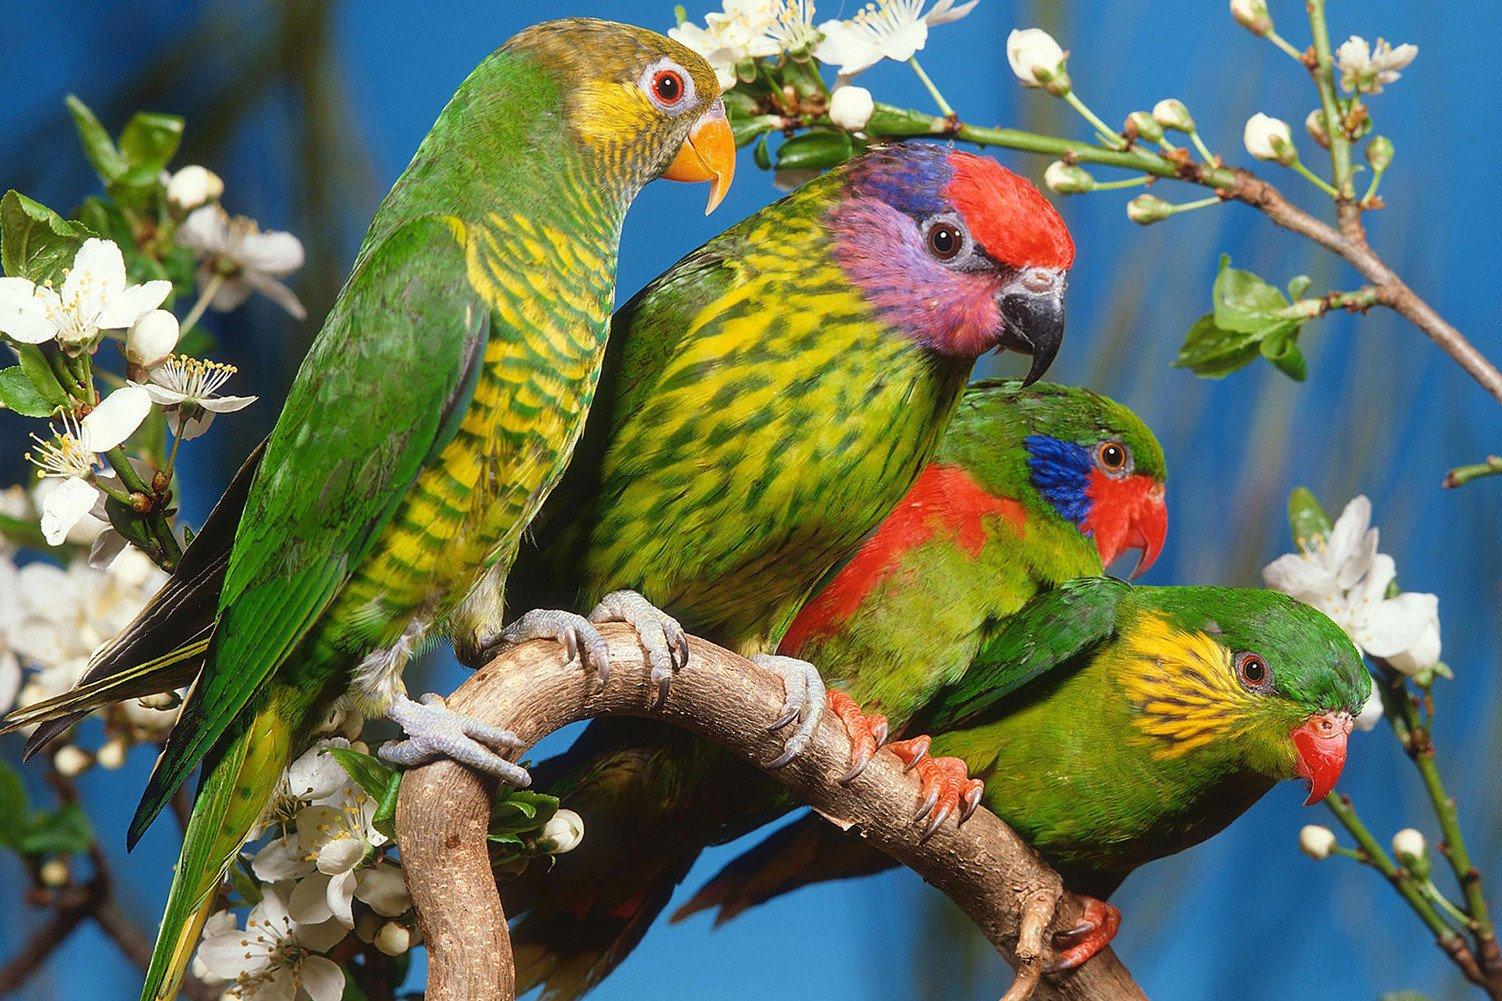 CHOIS Custom Films CF3313 Animal Parrots Birds Flowers Glass Window DIY Stickers 4' W by 3' H